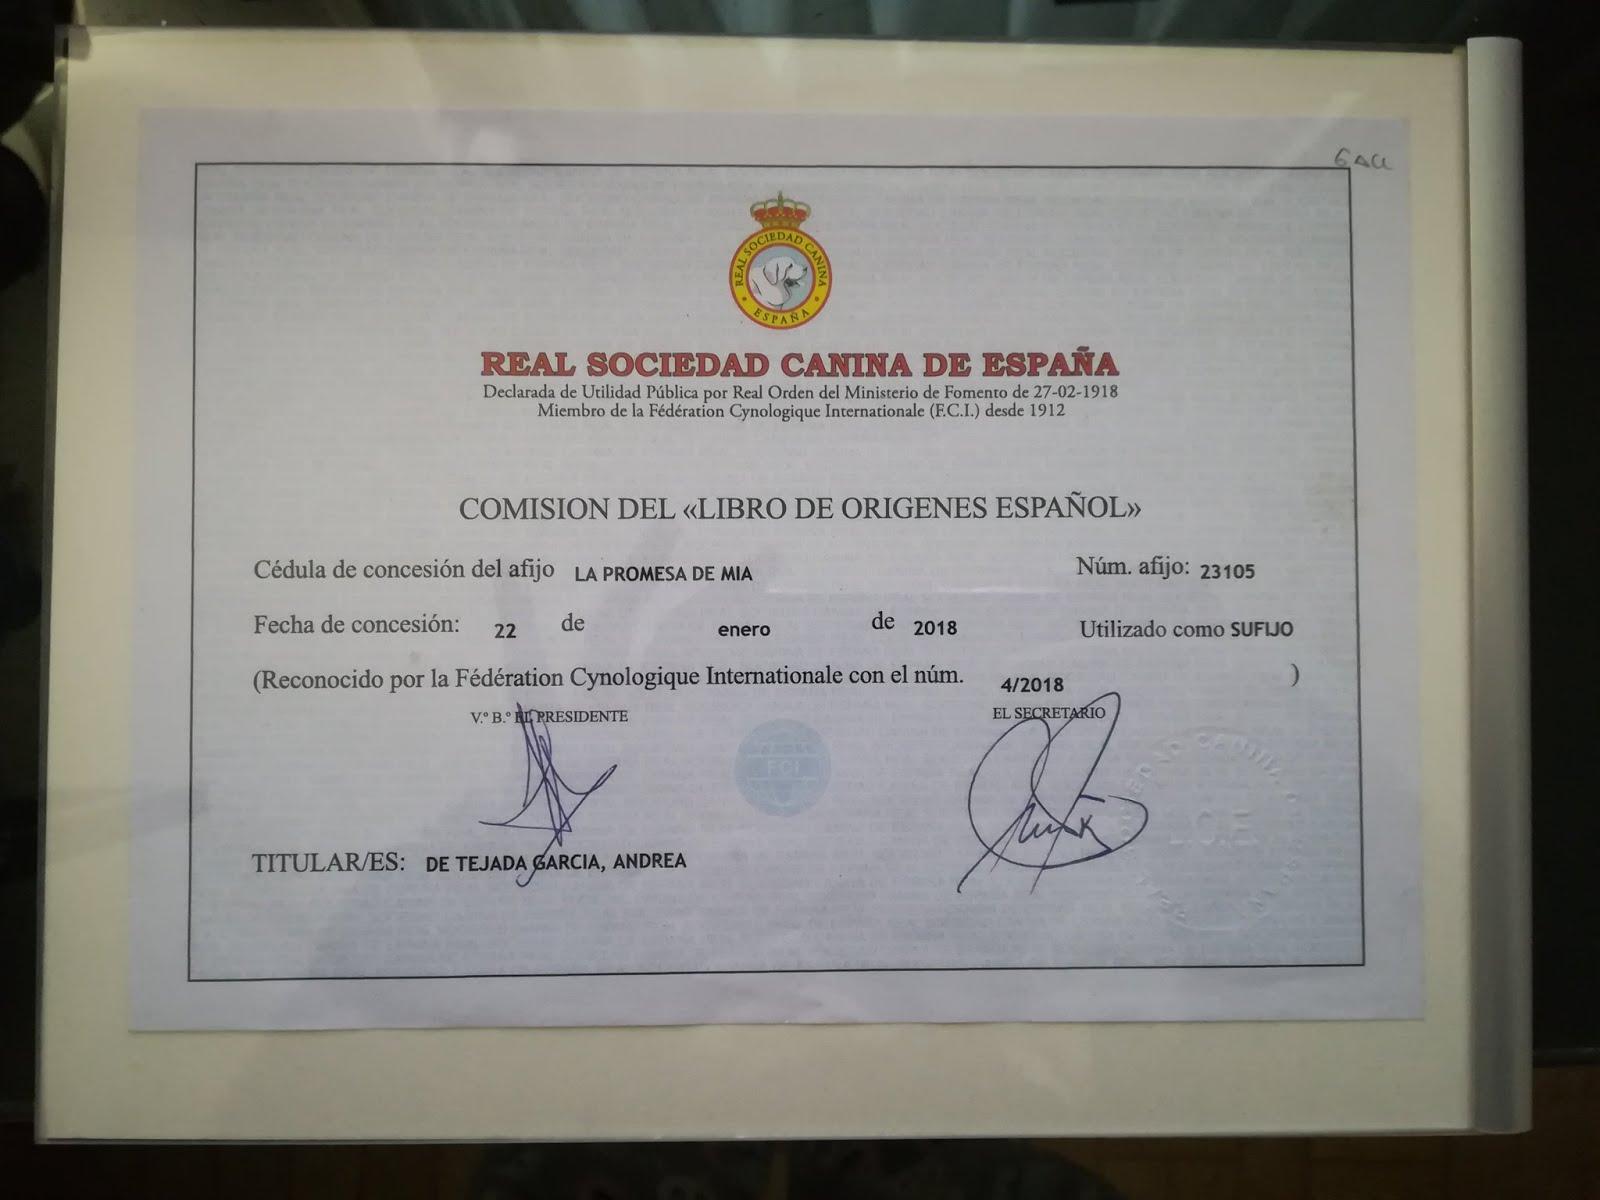 Nº AFIJO Y SOCIO RSC: 1305